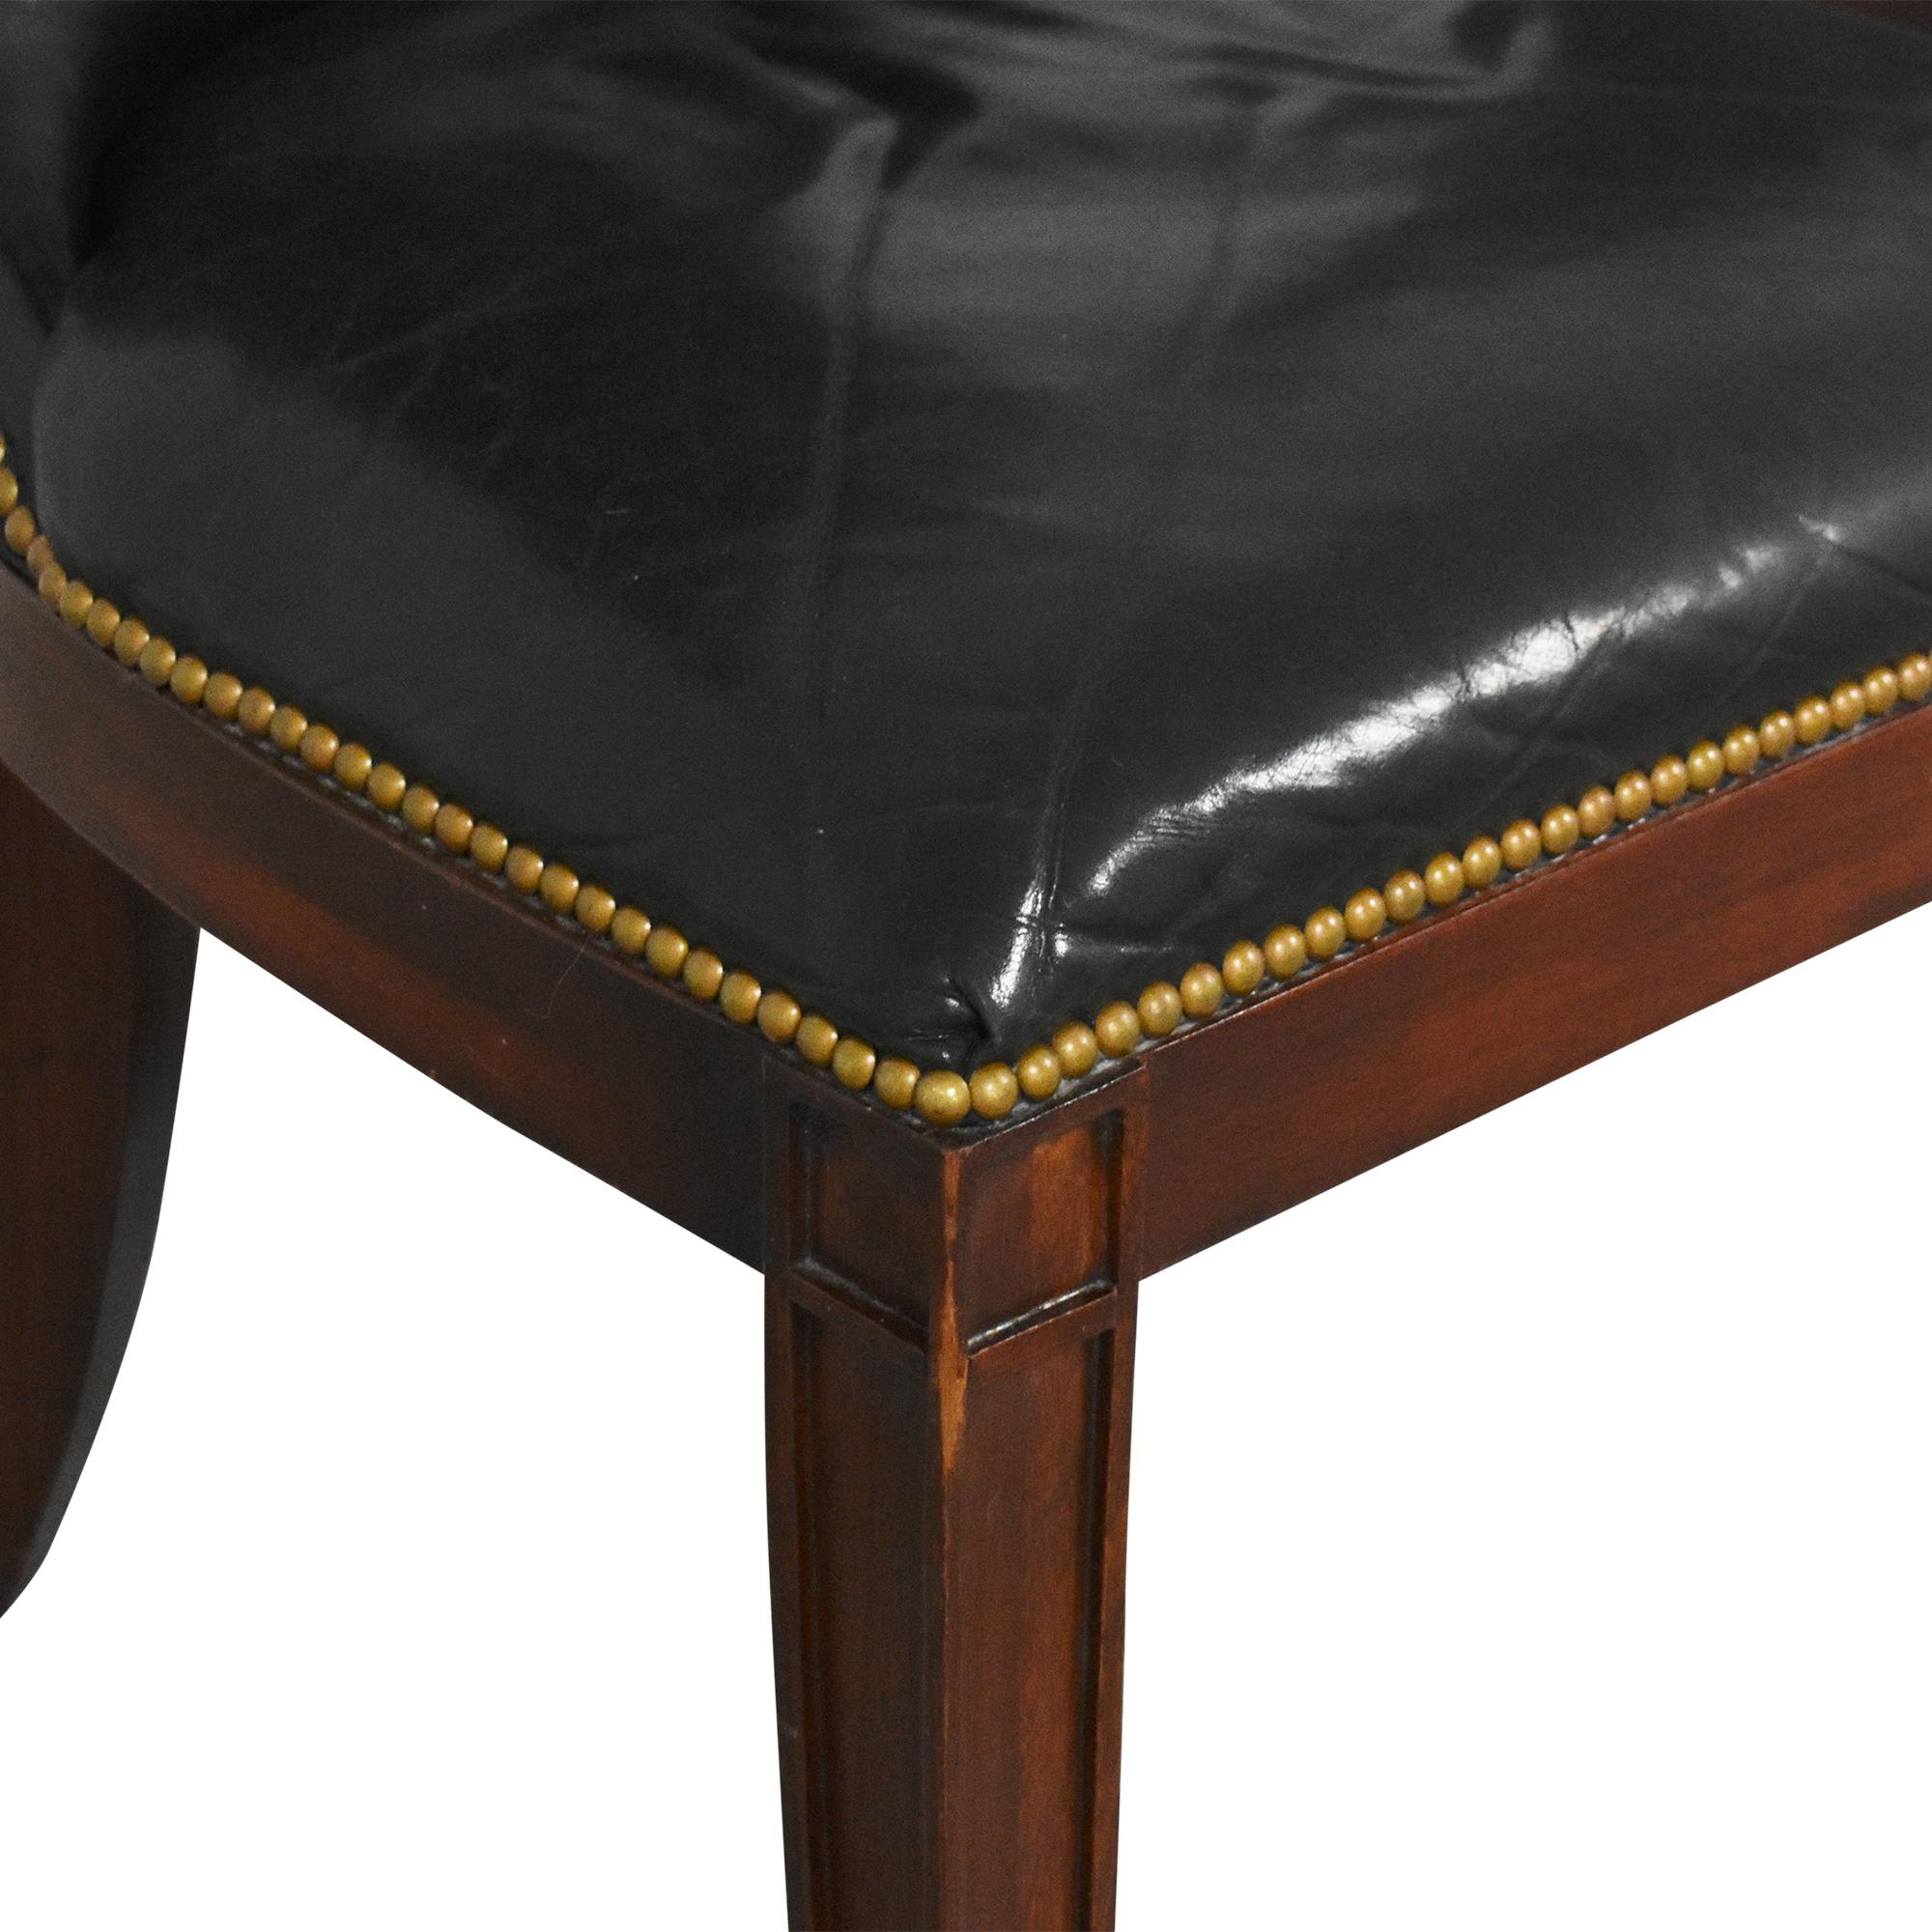 buy Ralph Lauren Nailhead Trim Dining Chairs Ralph Lauren Home Dining Chairs